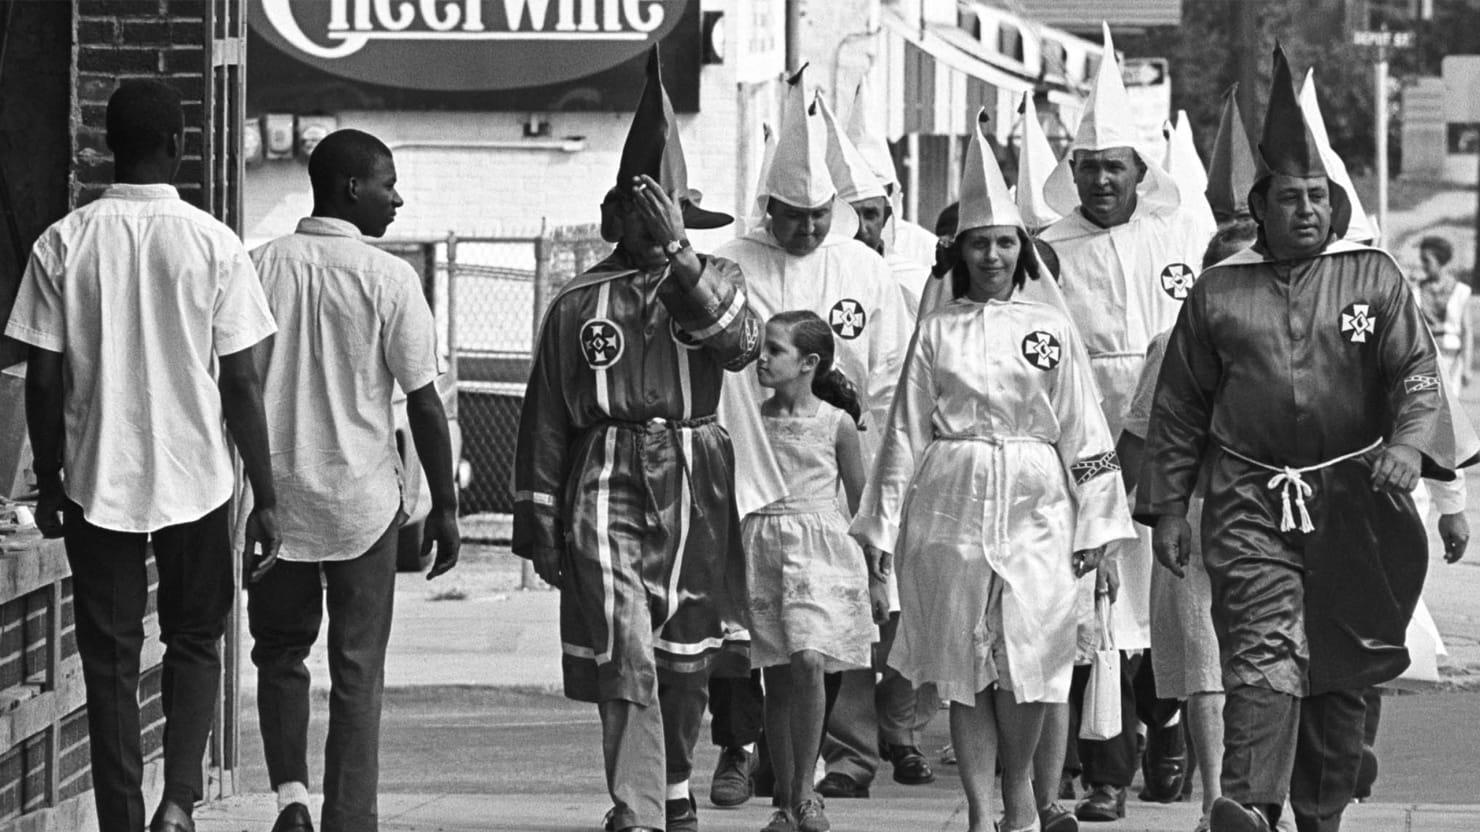 New Documentary Shows The 'Moderate' Klan of North Carolina